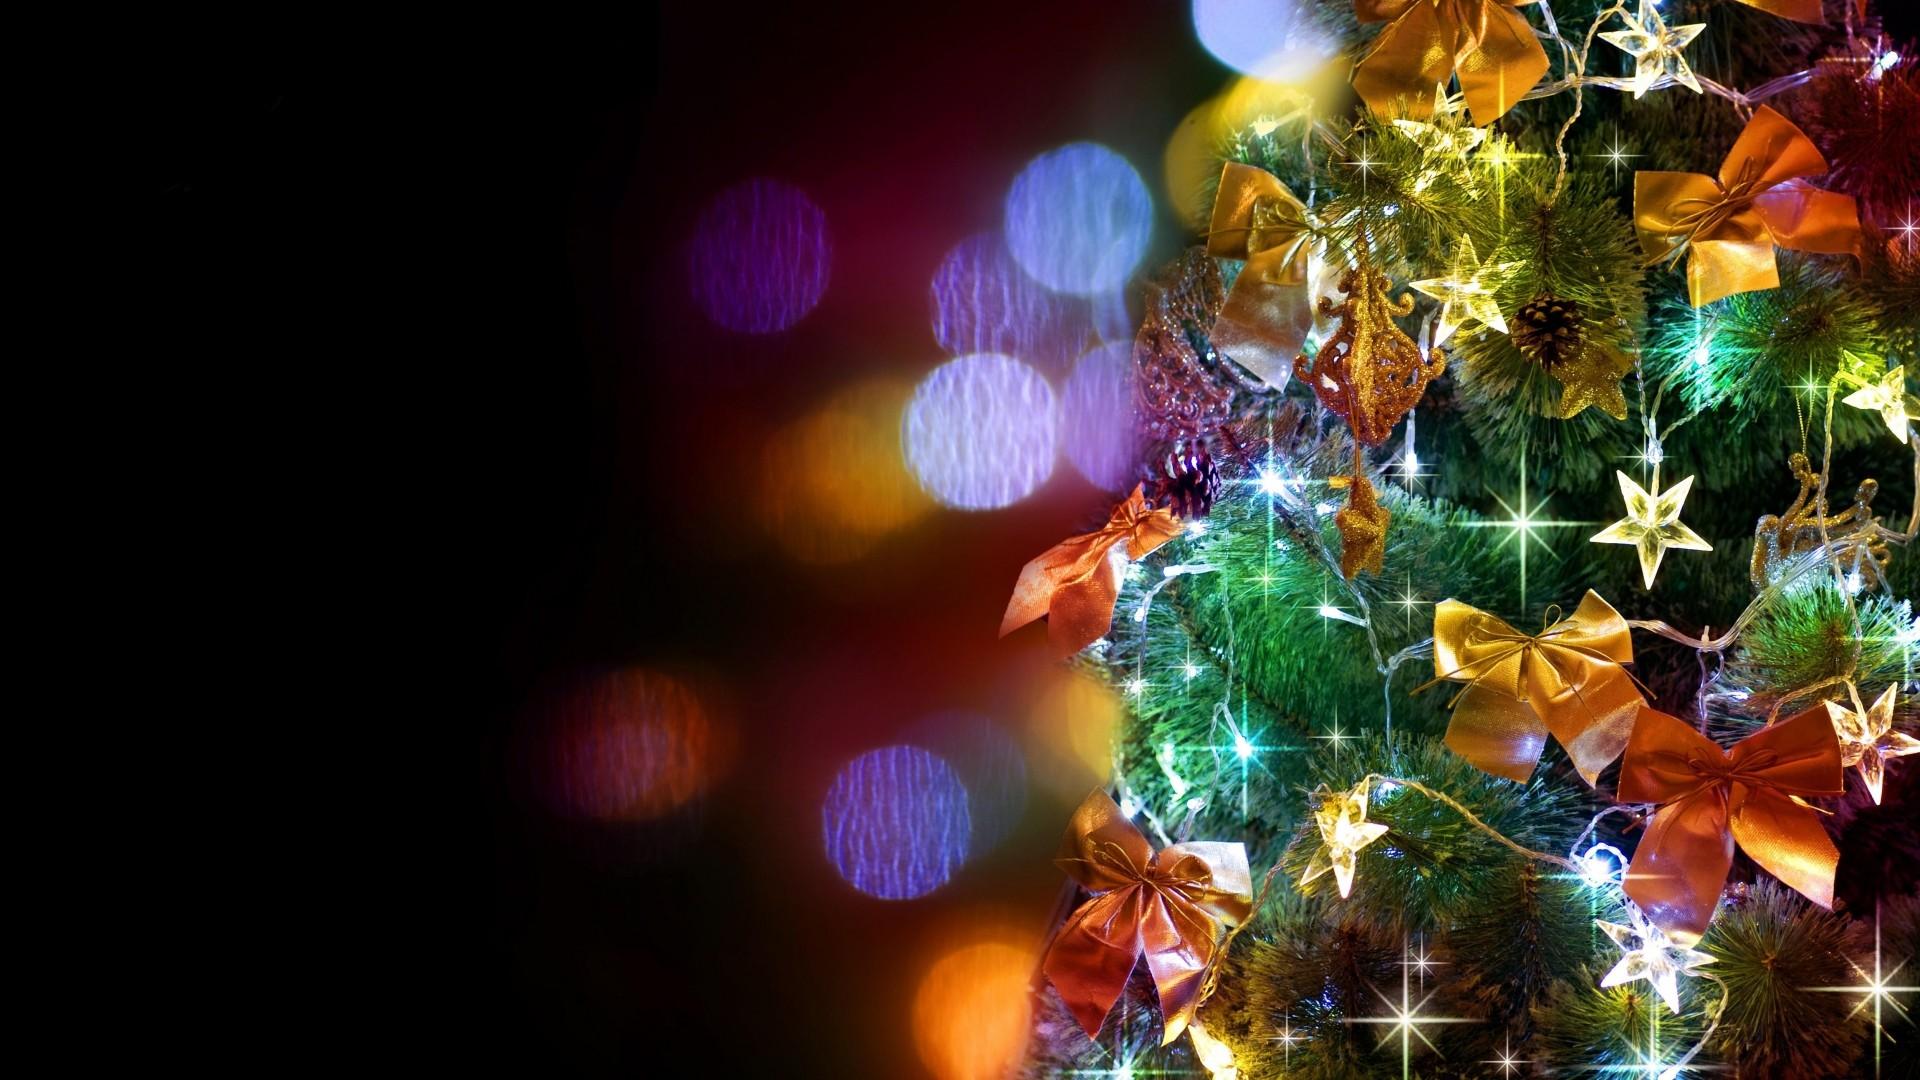 Christmas Wallpaper Hd 1920×1080